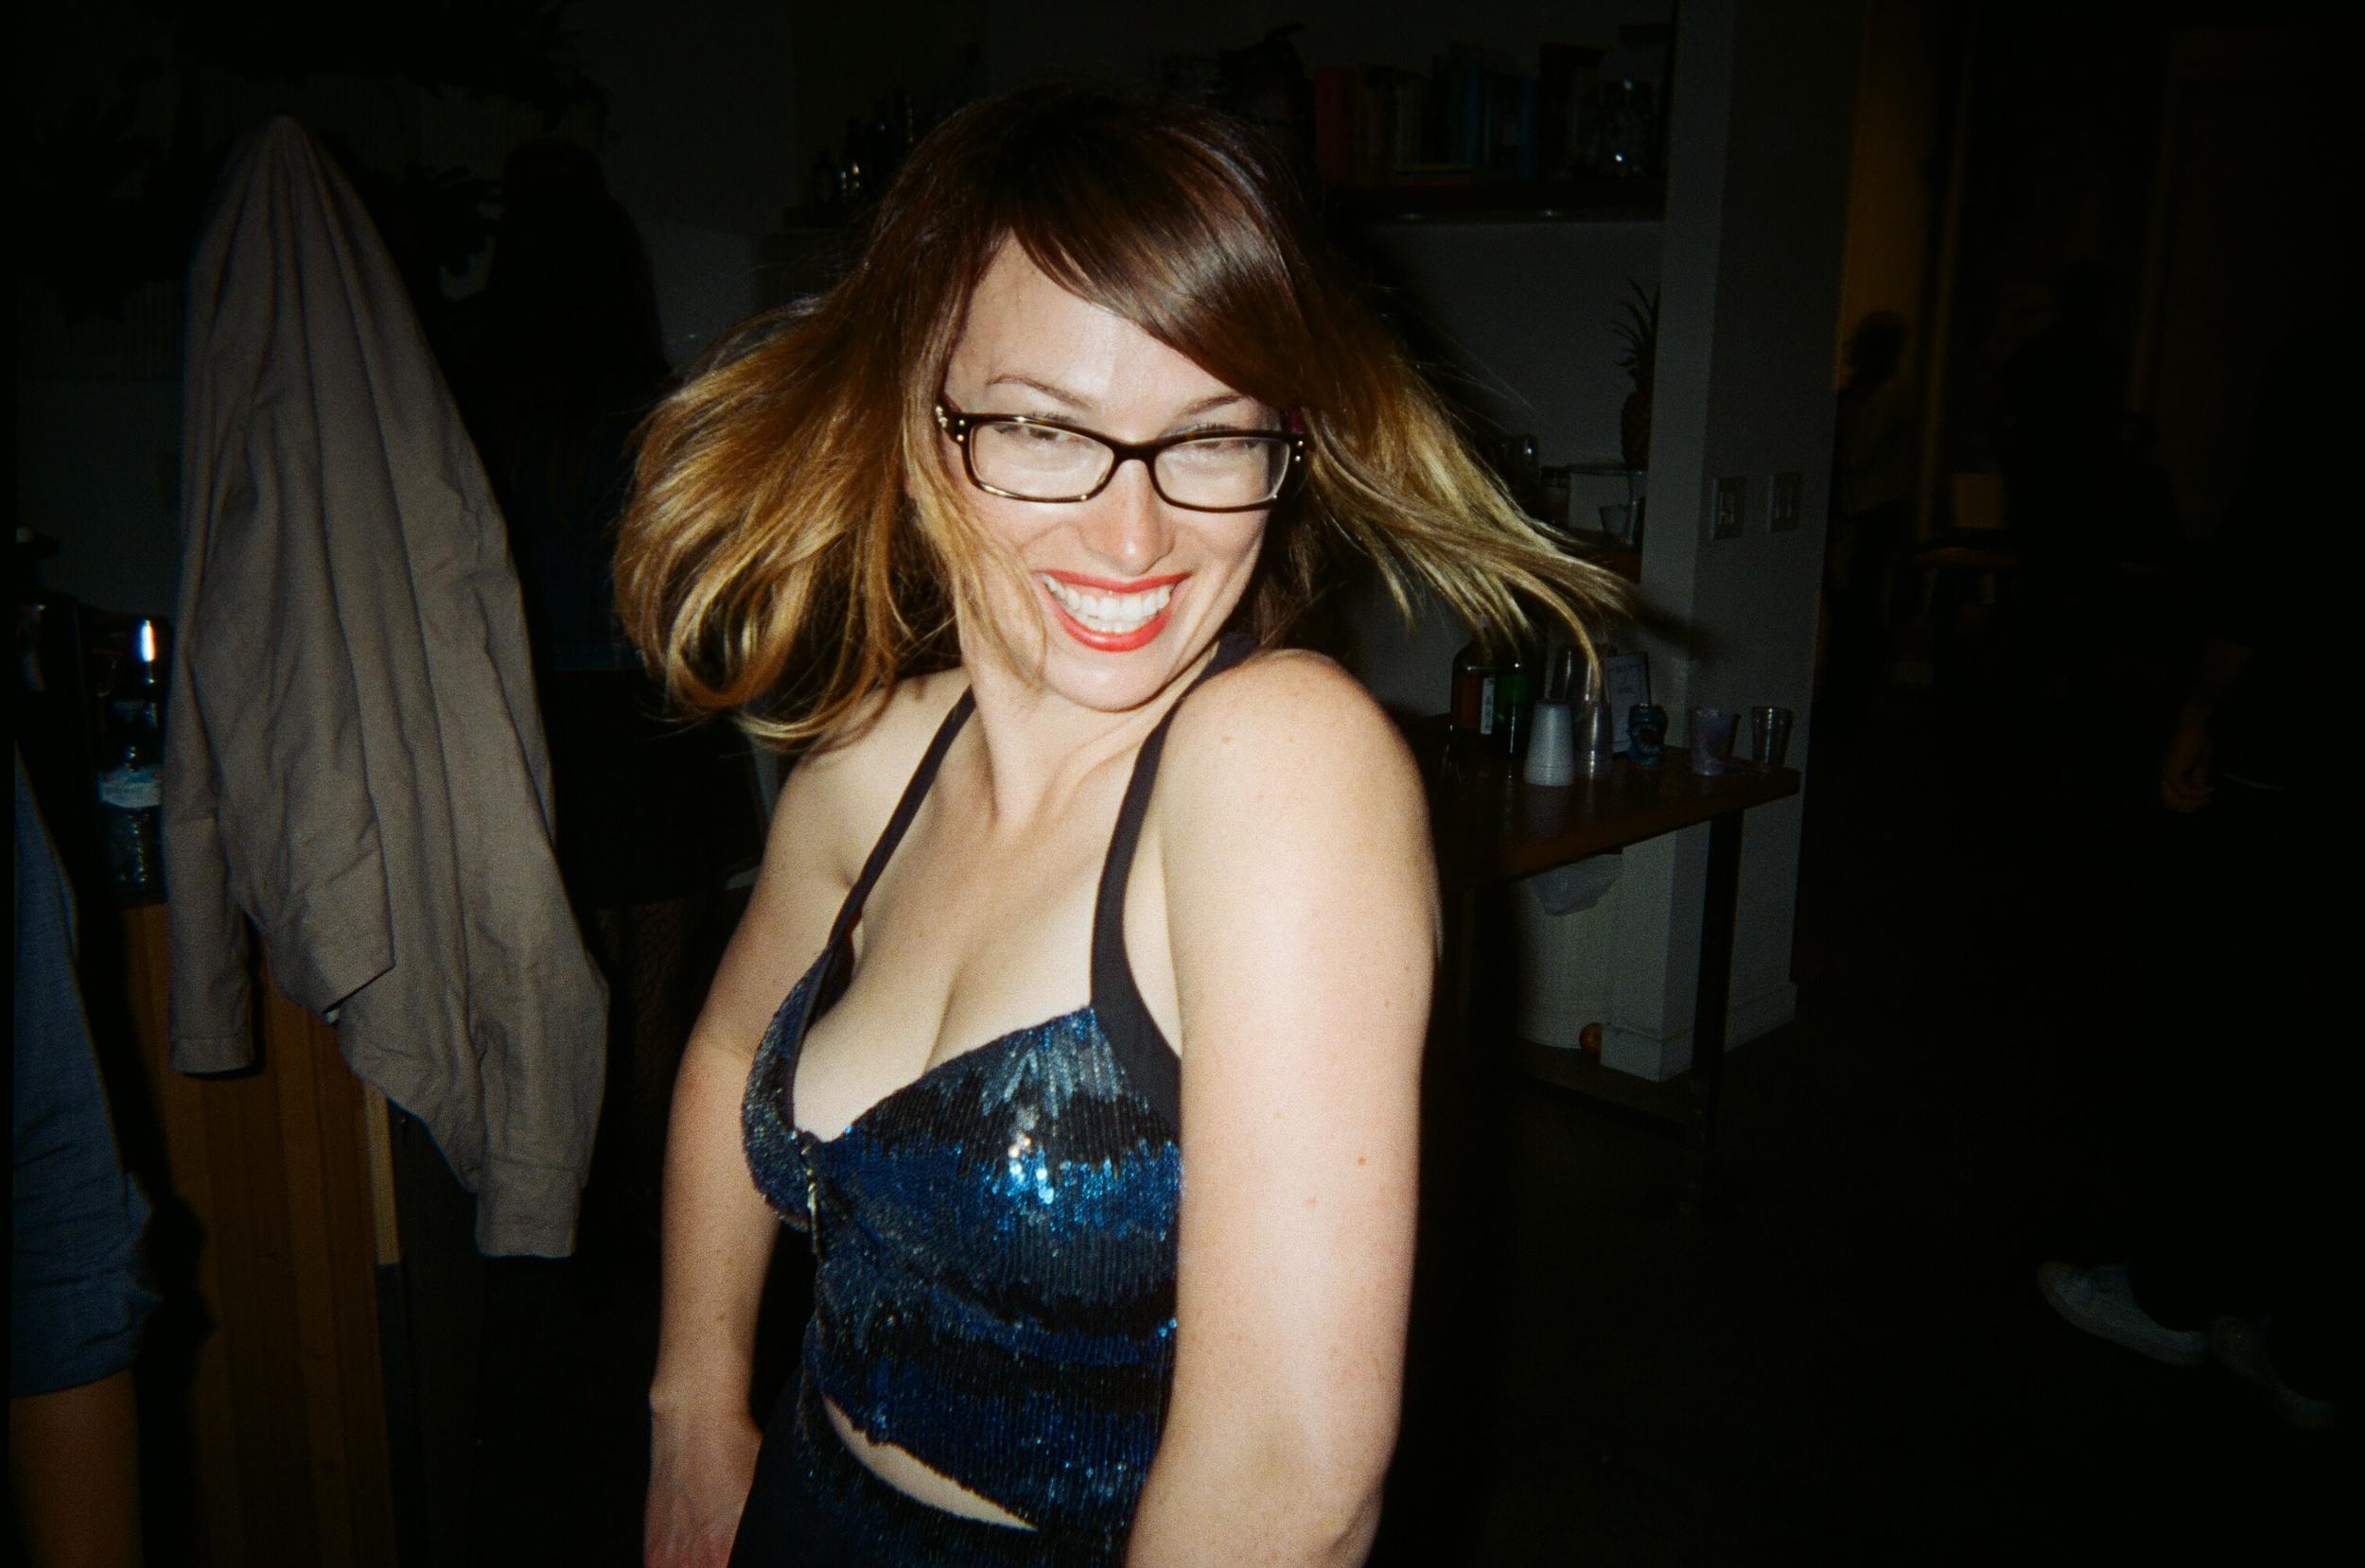 Katie Stewart, light of my life